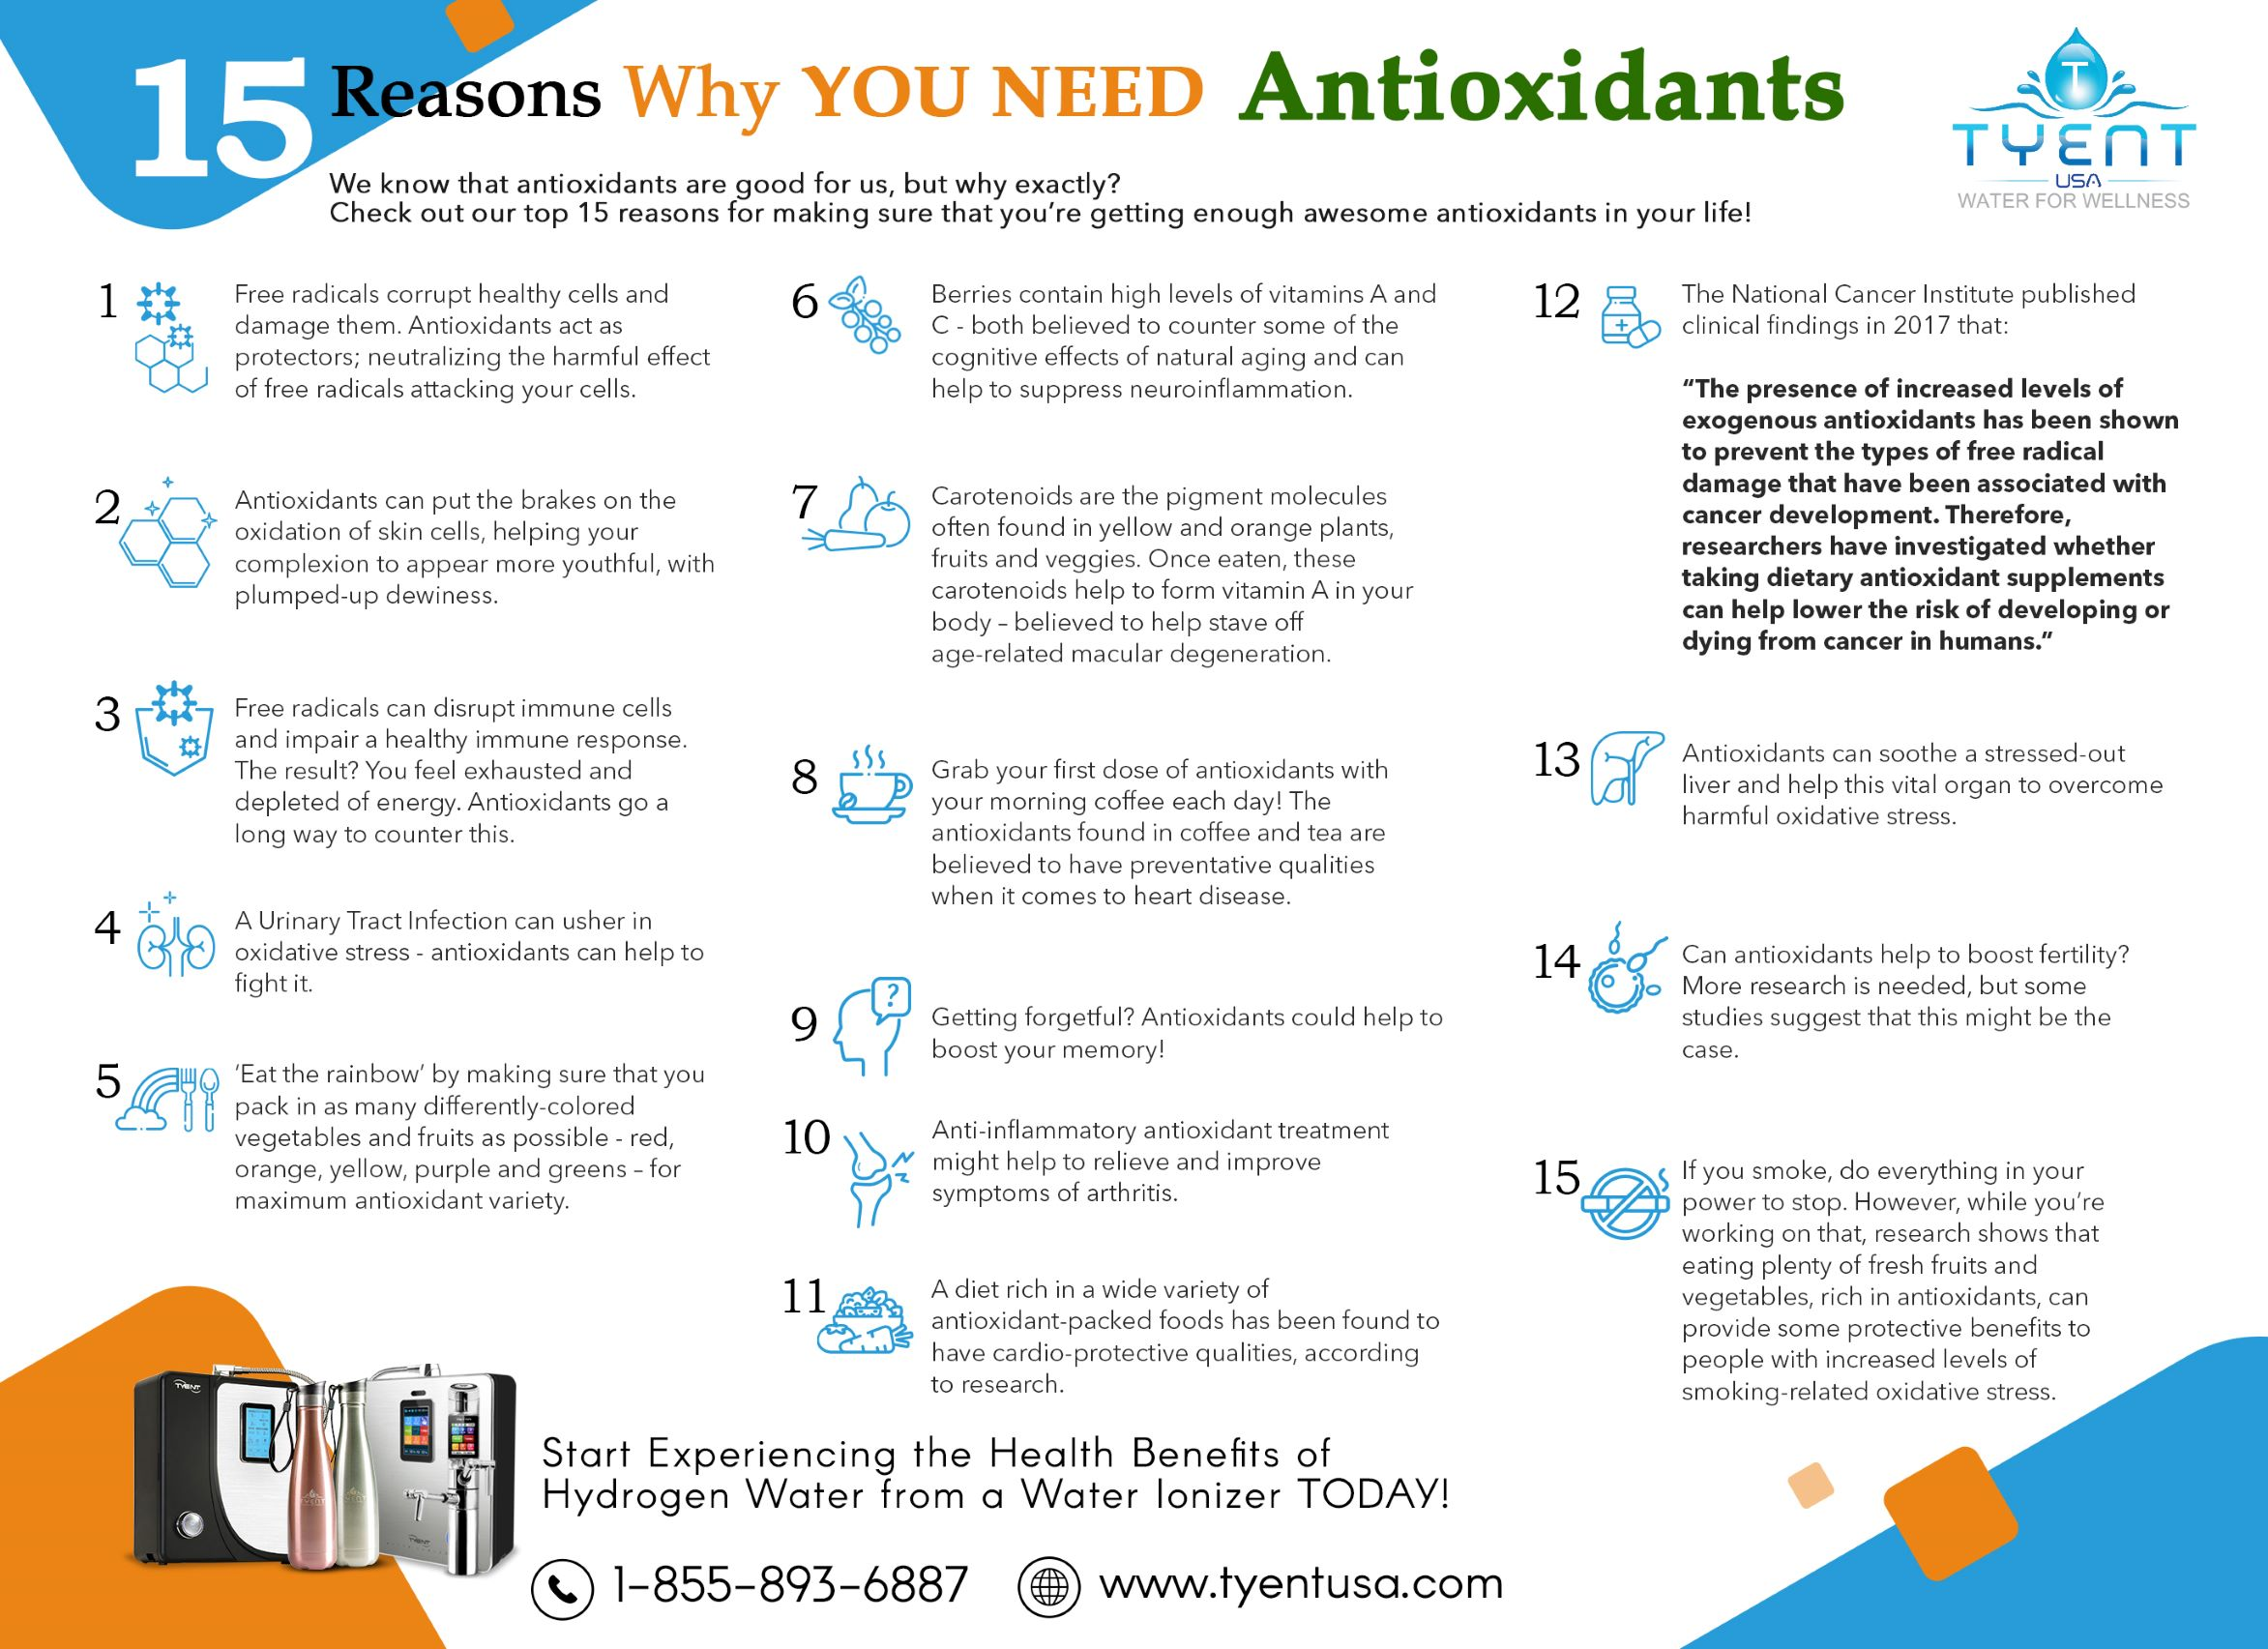 15 Reasons Why You Need Antioxidants